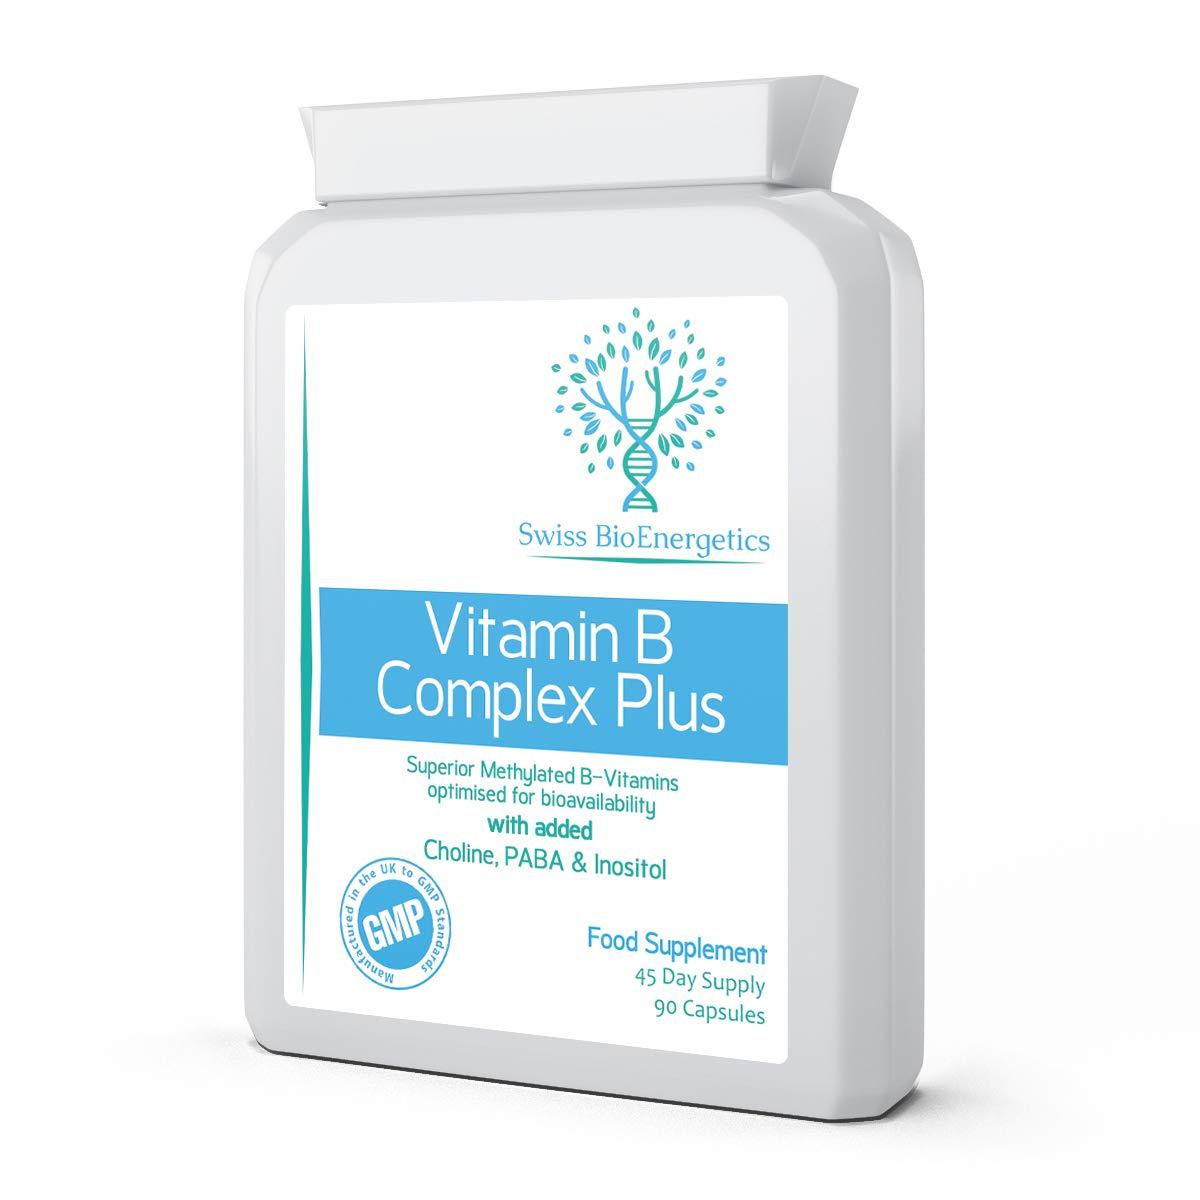 Vitamin B Complex Plus - 90 Capsules - Superior Methylated Formula with Added Choline, PABA & Inositol - Includes Essential Multi B-Vitamins B1, B2, B3, B5, B6, B12, Biotin & Folate